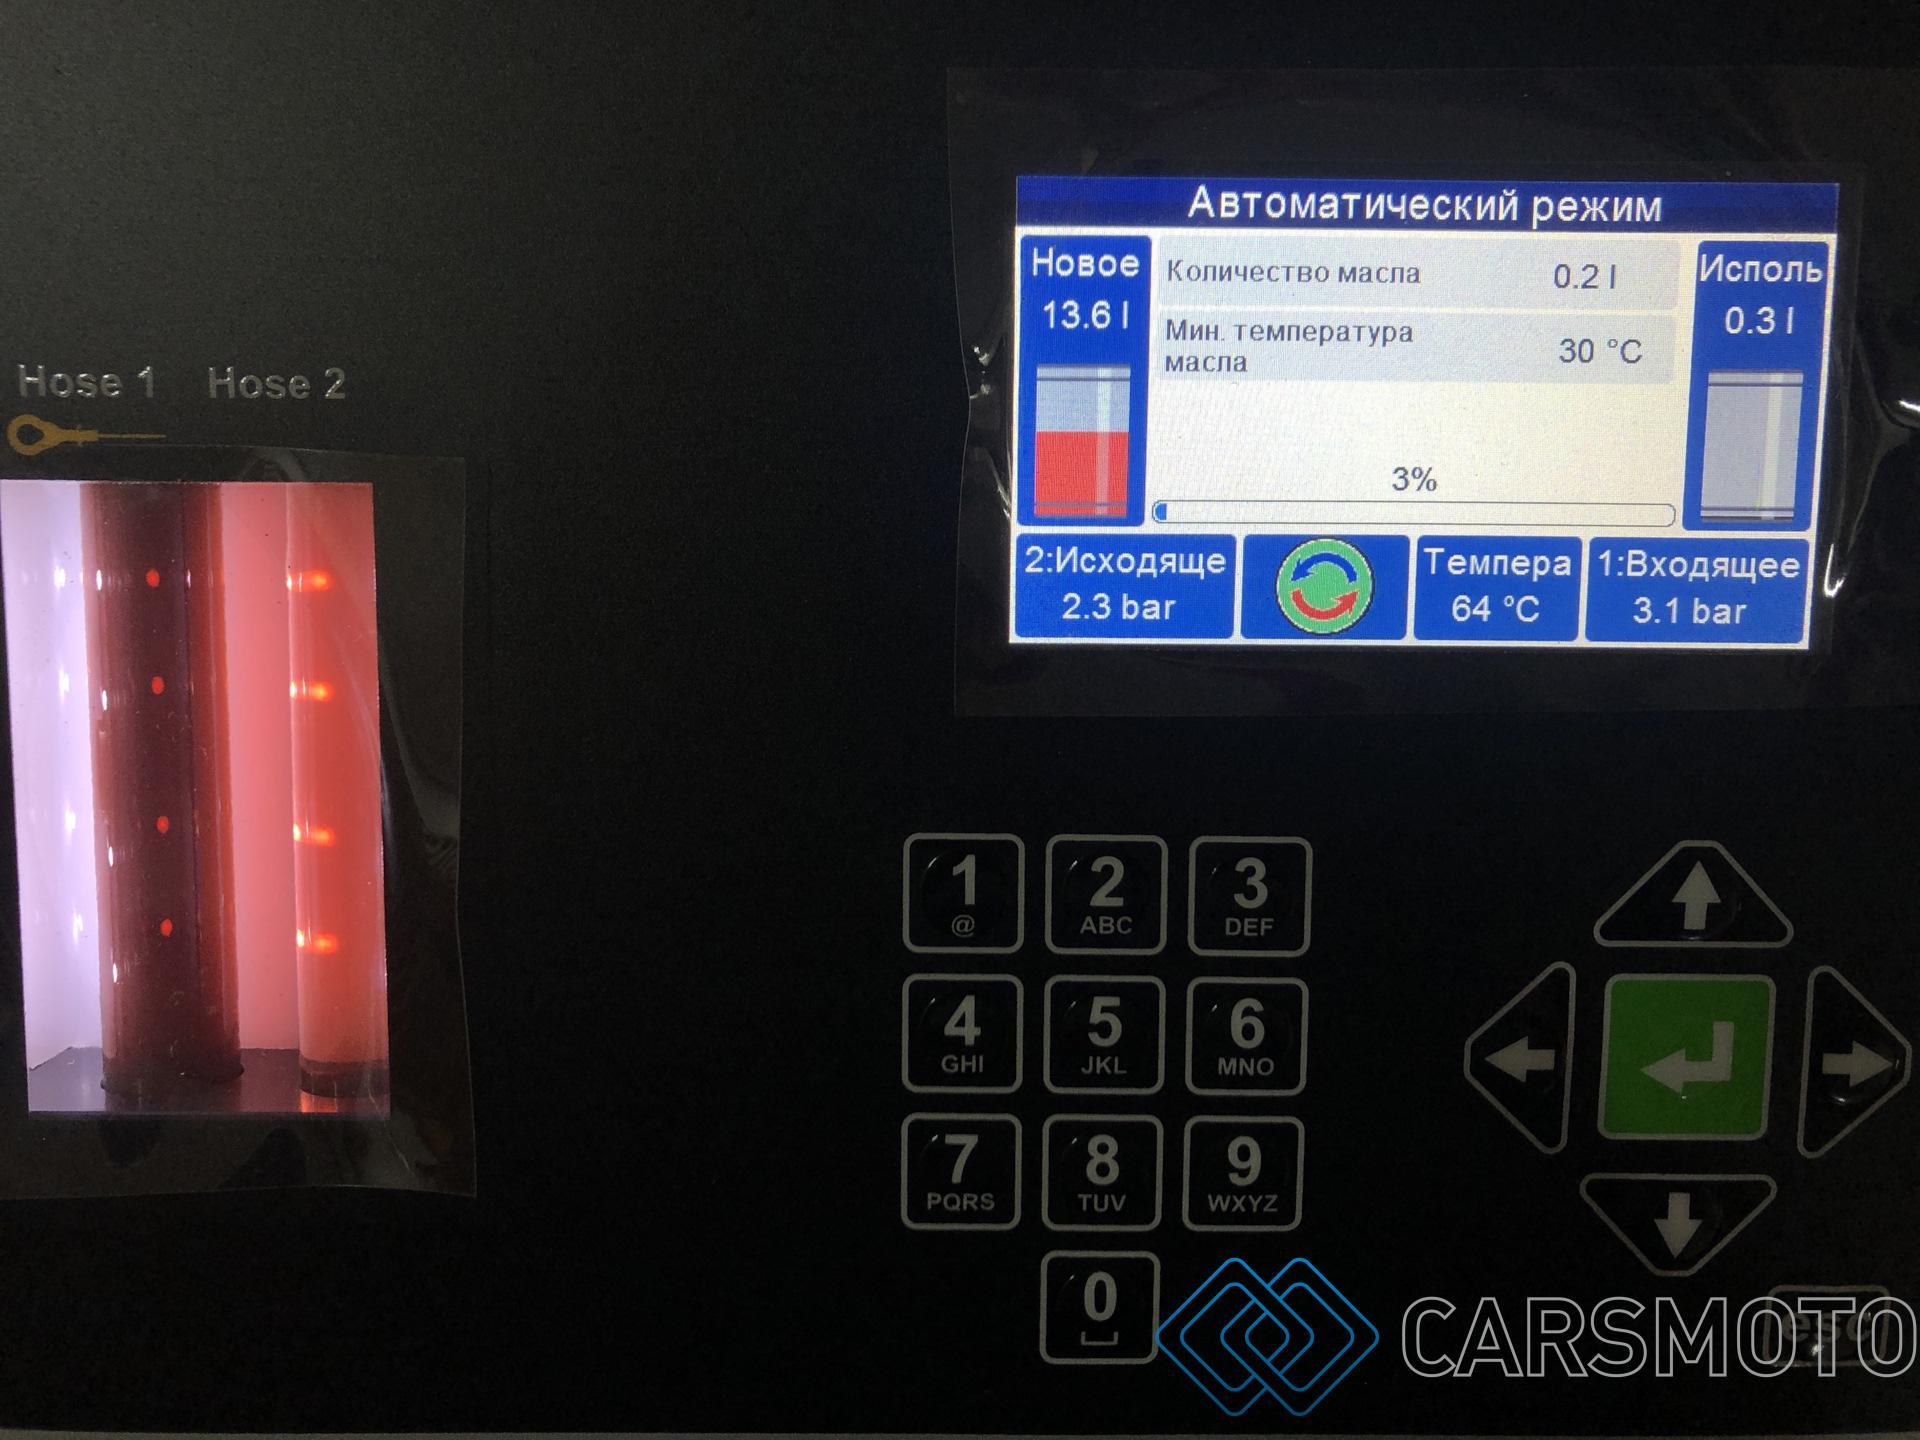 Полная аппаратная замена масла АКПП Mazda CX-9 3.7 4WD (TB)